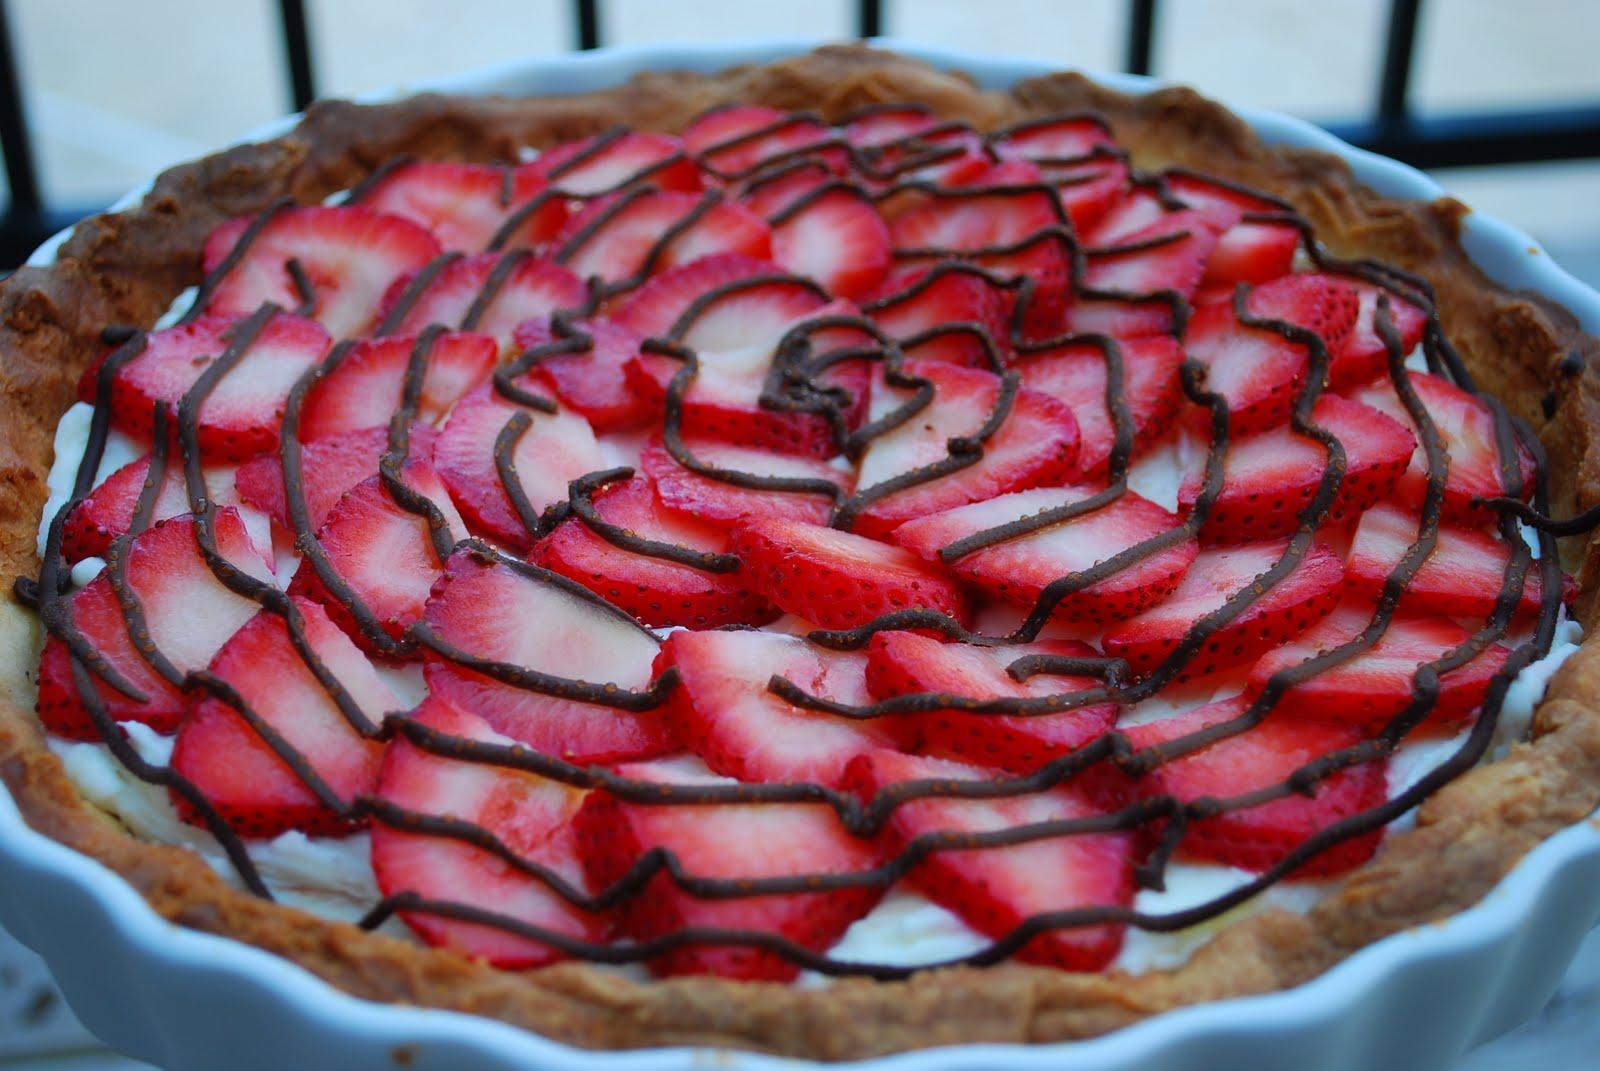 Lexi's Treats: Strawberry Cream Cheese Tart